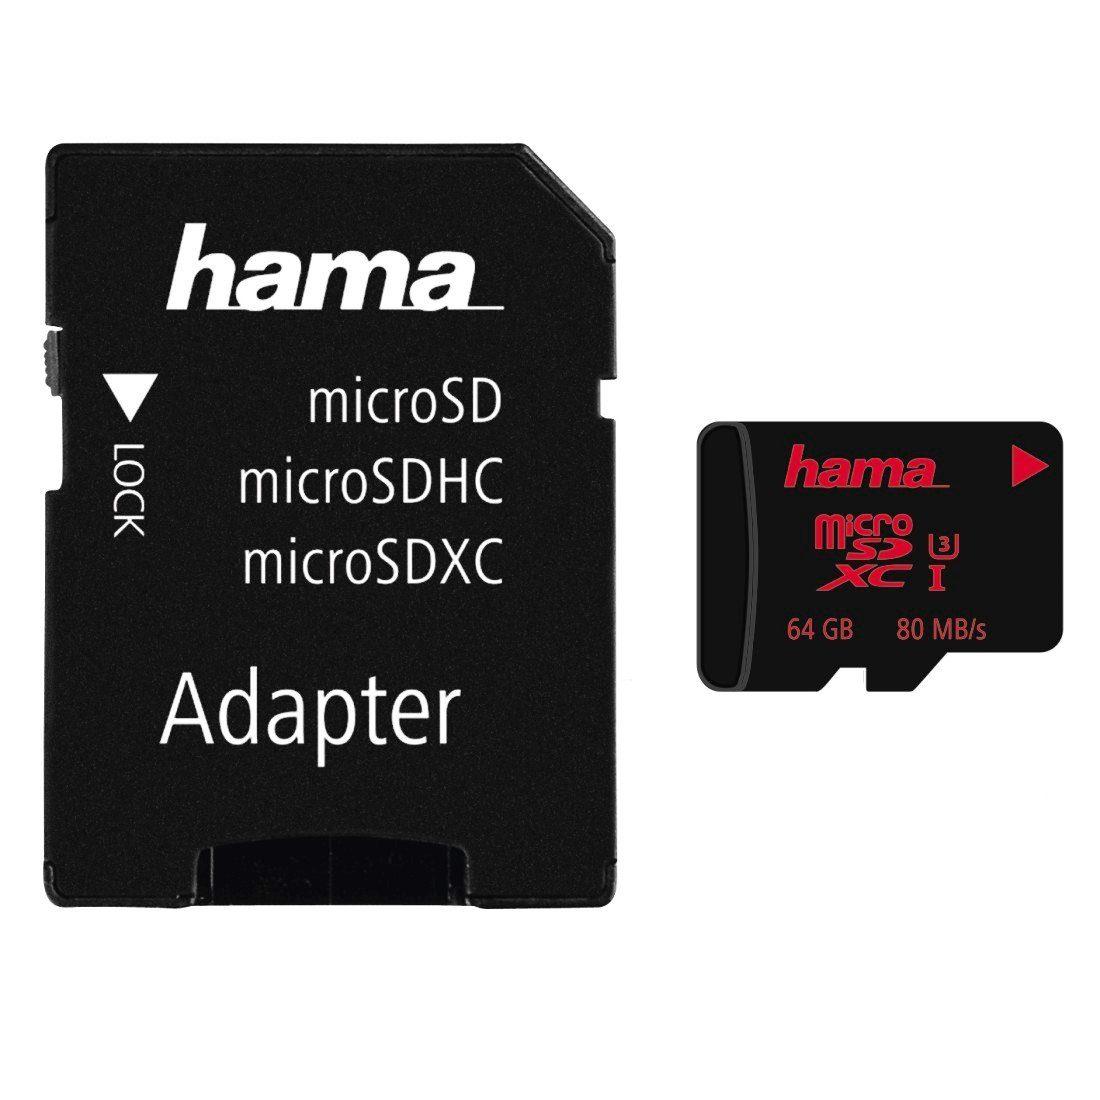 Hama Speicherkarte microSDXC 64GB UHS Speed Class 3 UHS-I80 MB/s »inkl. Adapter auf SD Karte«